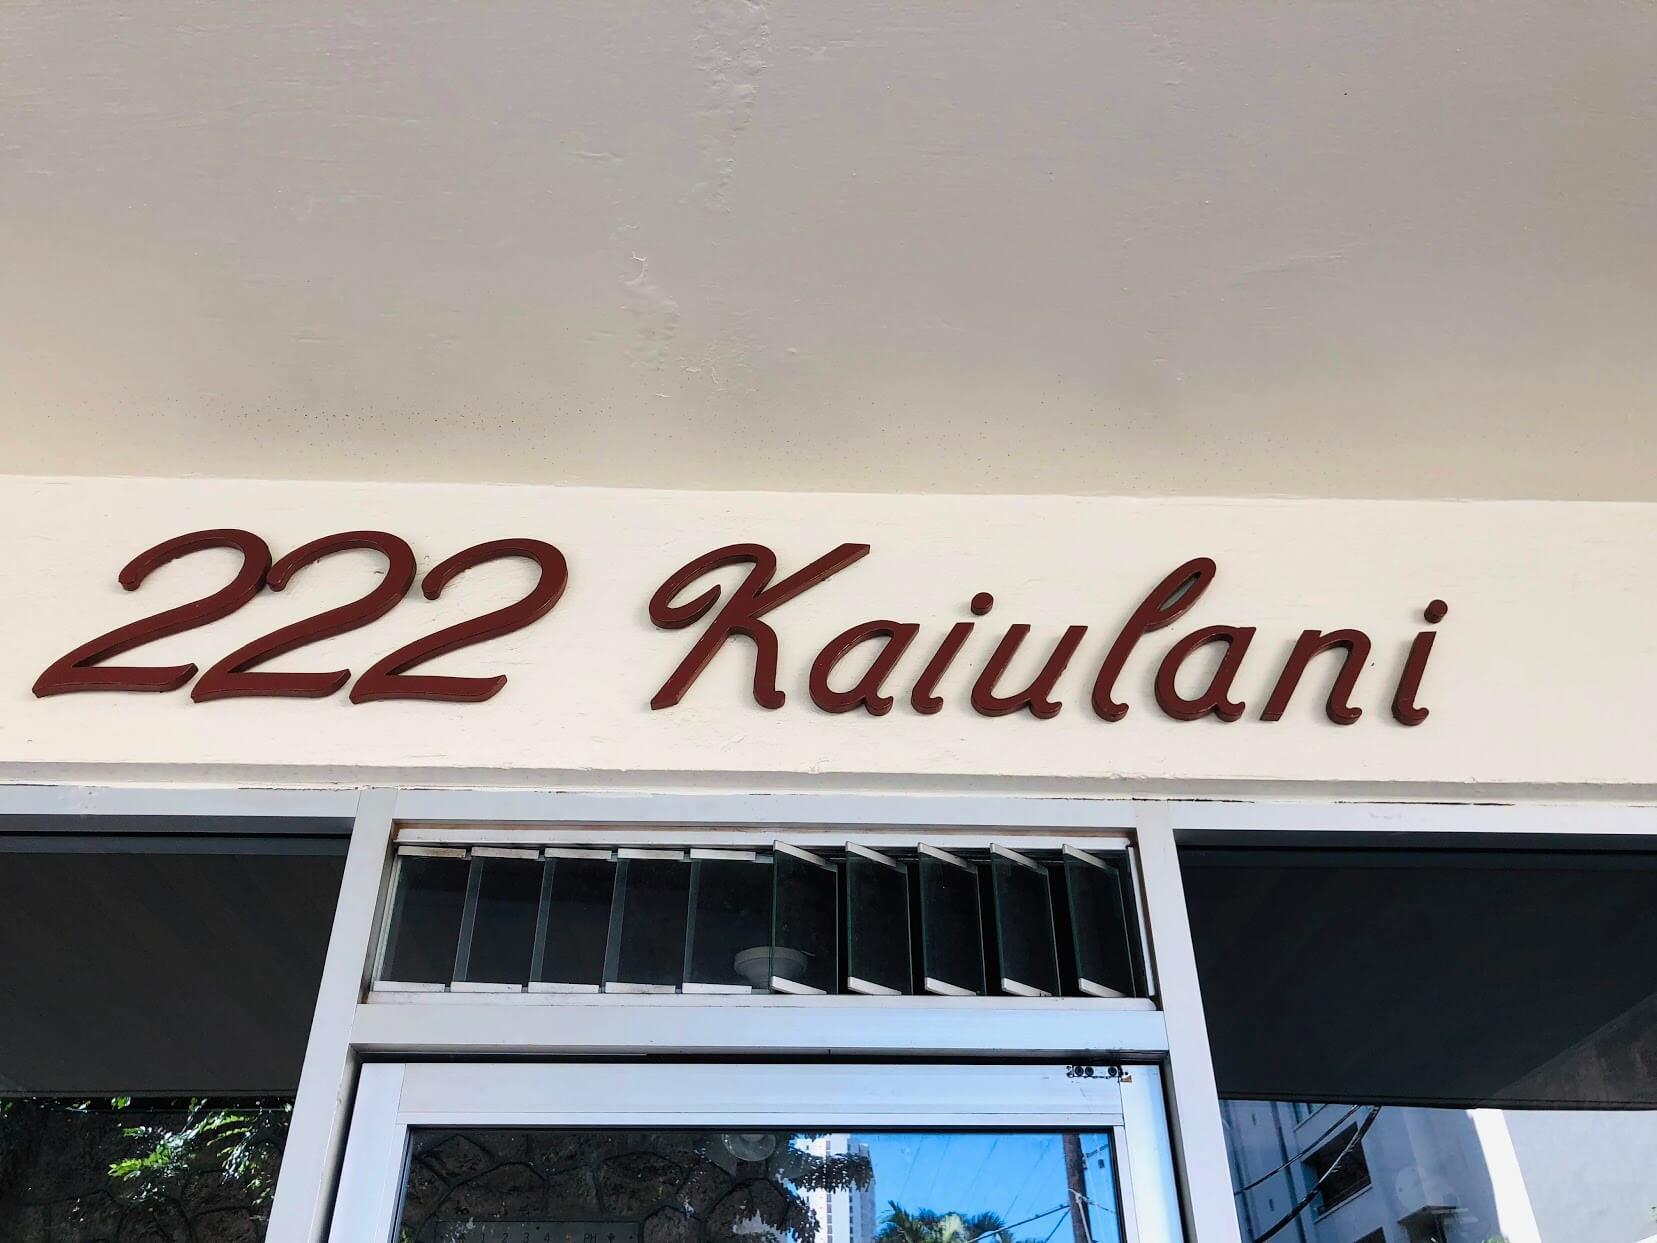 222 Kaiulani Apartmentsの看板